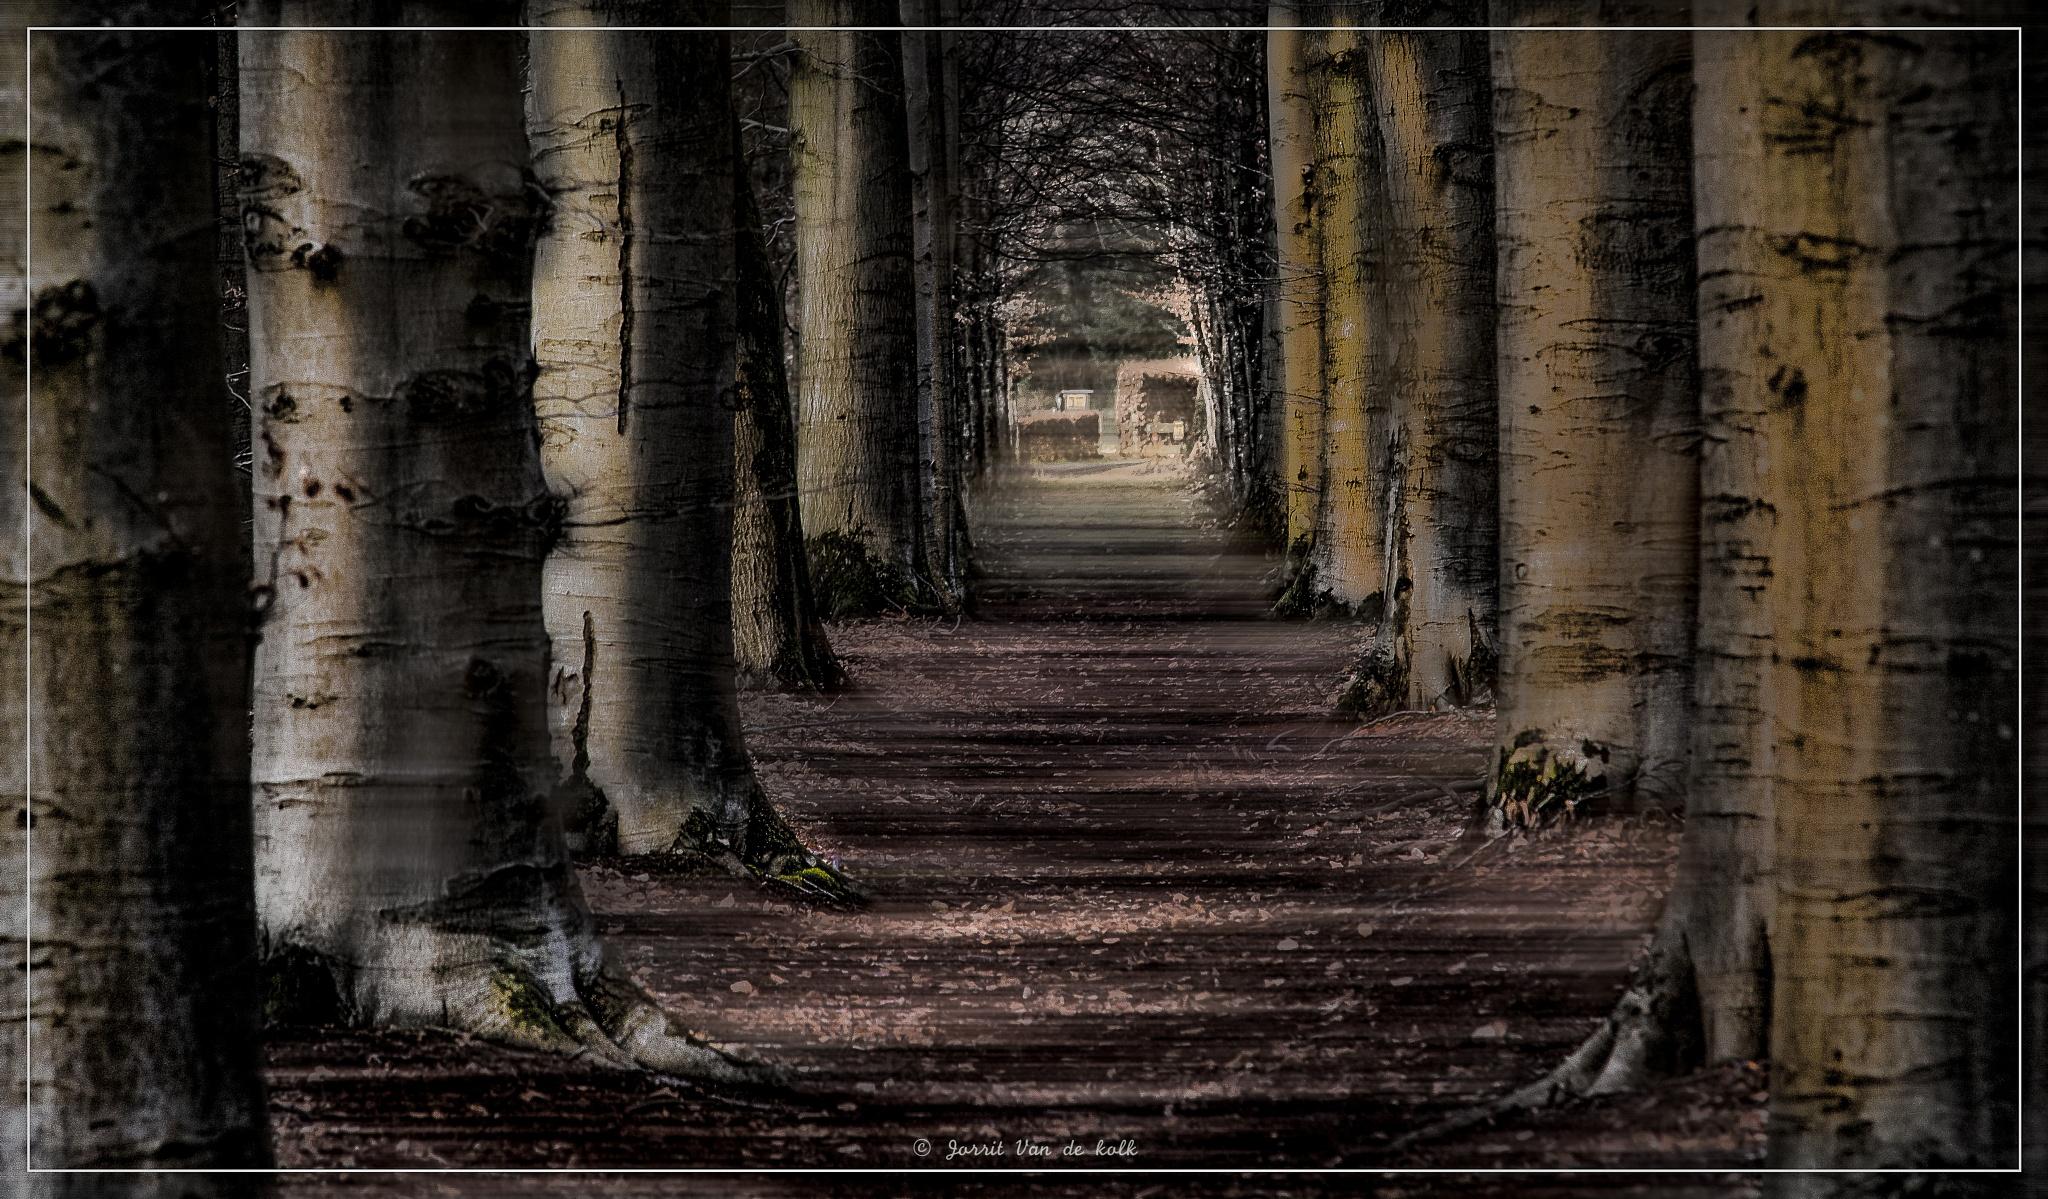 The way out of the forest.. by Jorrit van de kolk